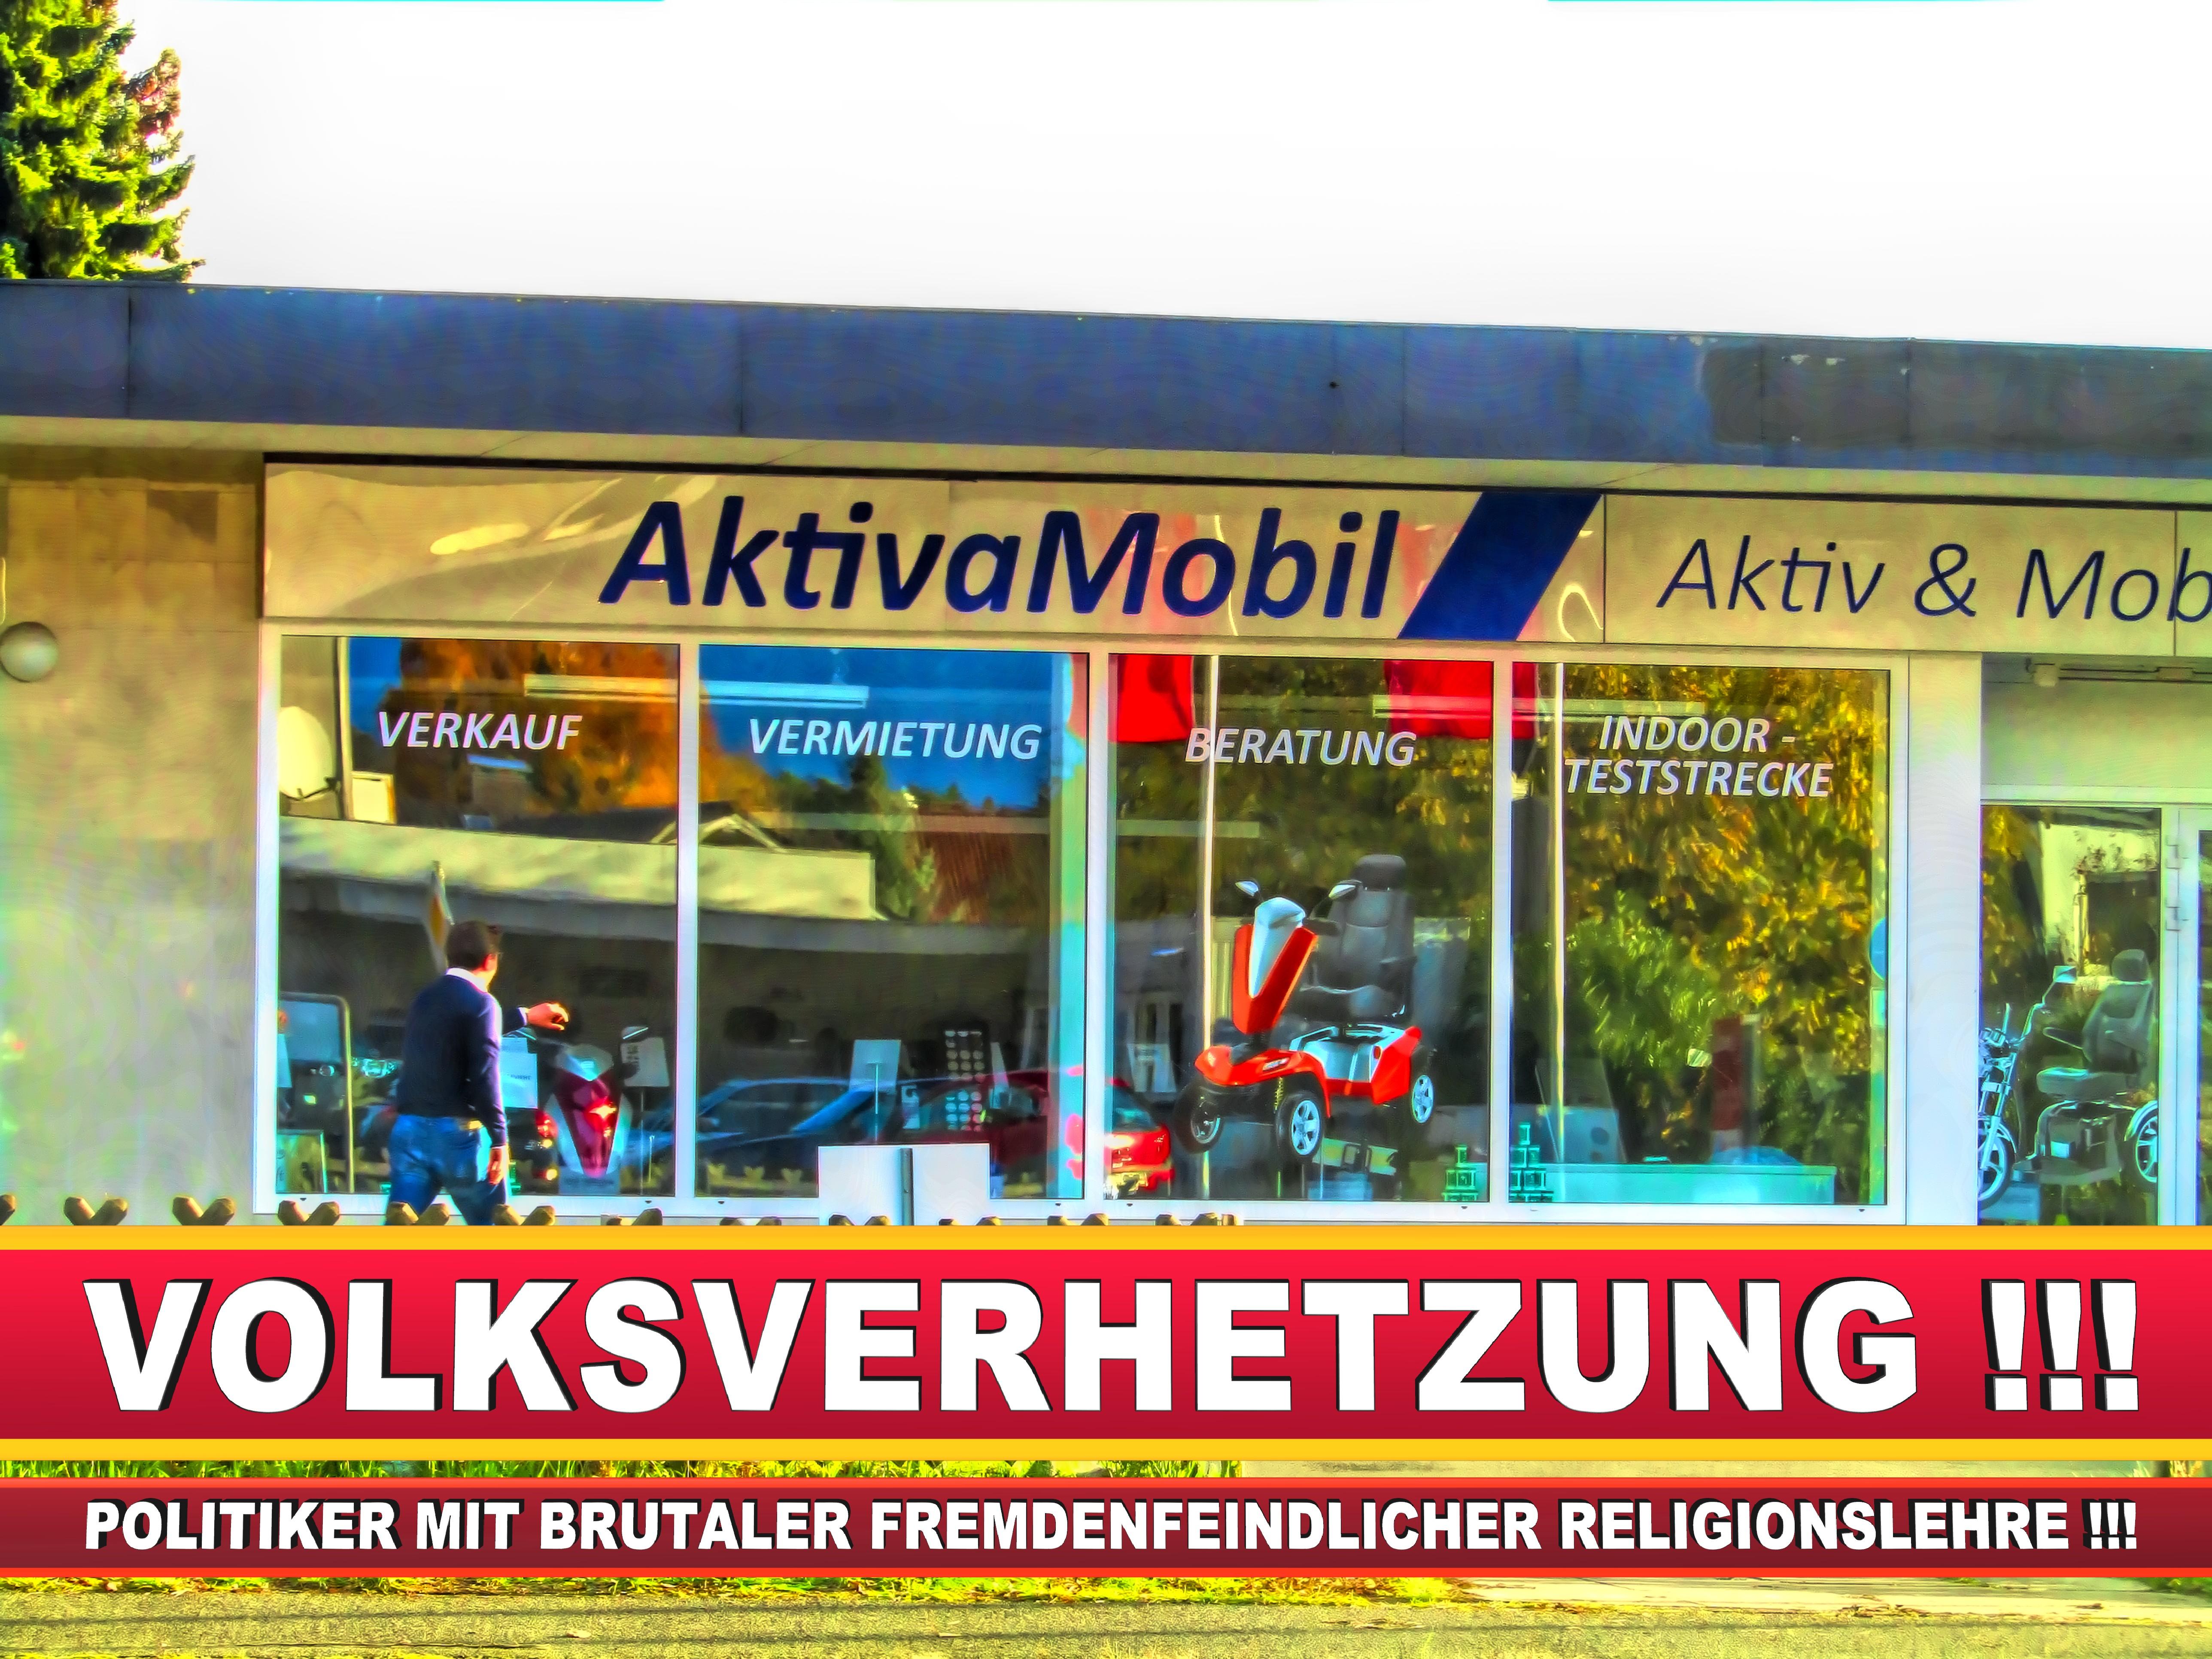 AKTIVA MOBILE BIELEFELD BADENER STR 1 33659 BIELEFELD CHRISTIANA THELEMANN